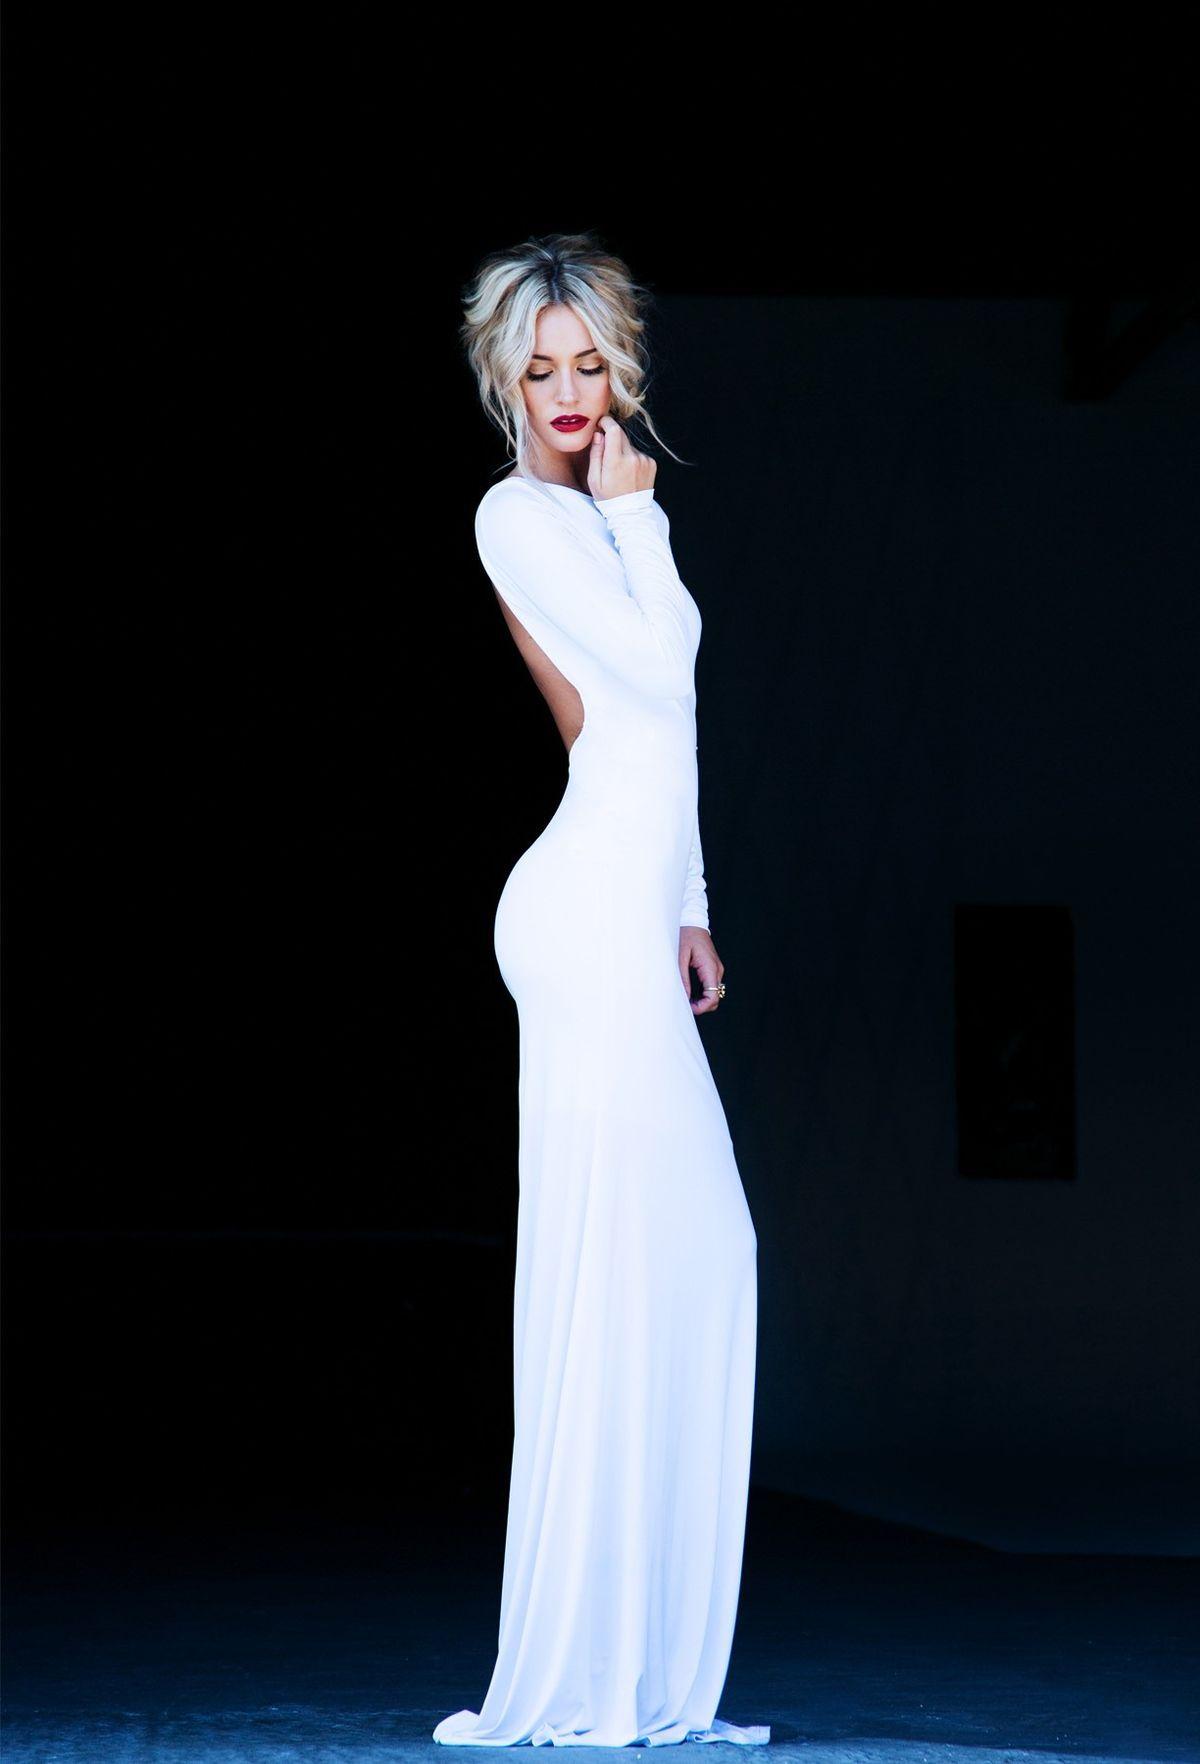 White Long Dress Long White Dress Evening Dresses Fancy Dresses [ 1764 x 1200 Pixel ]